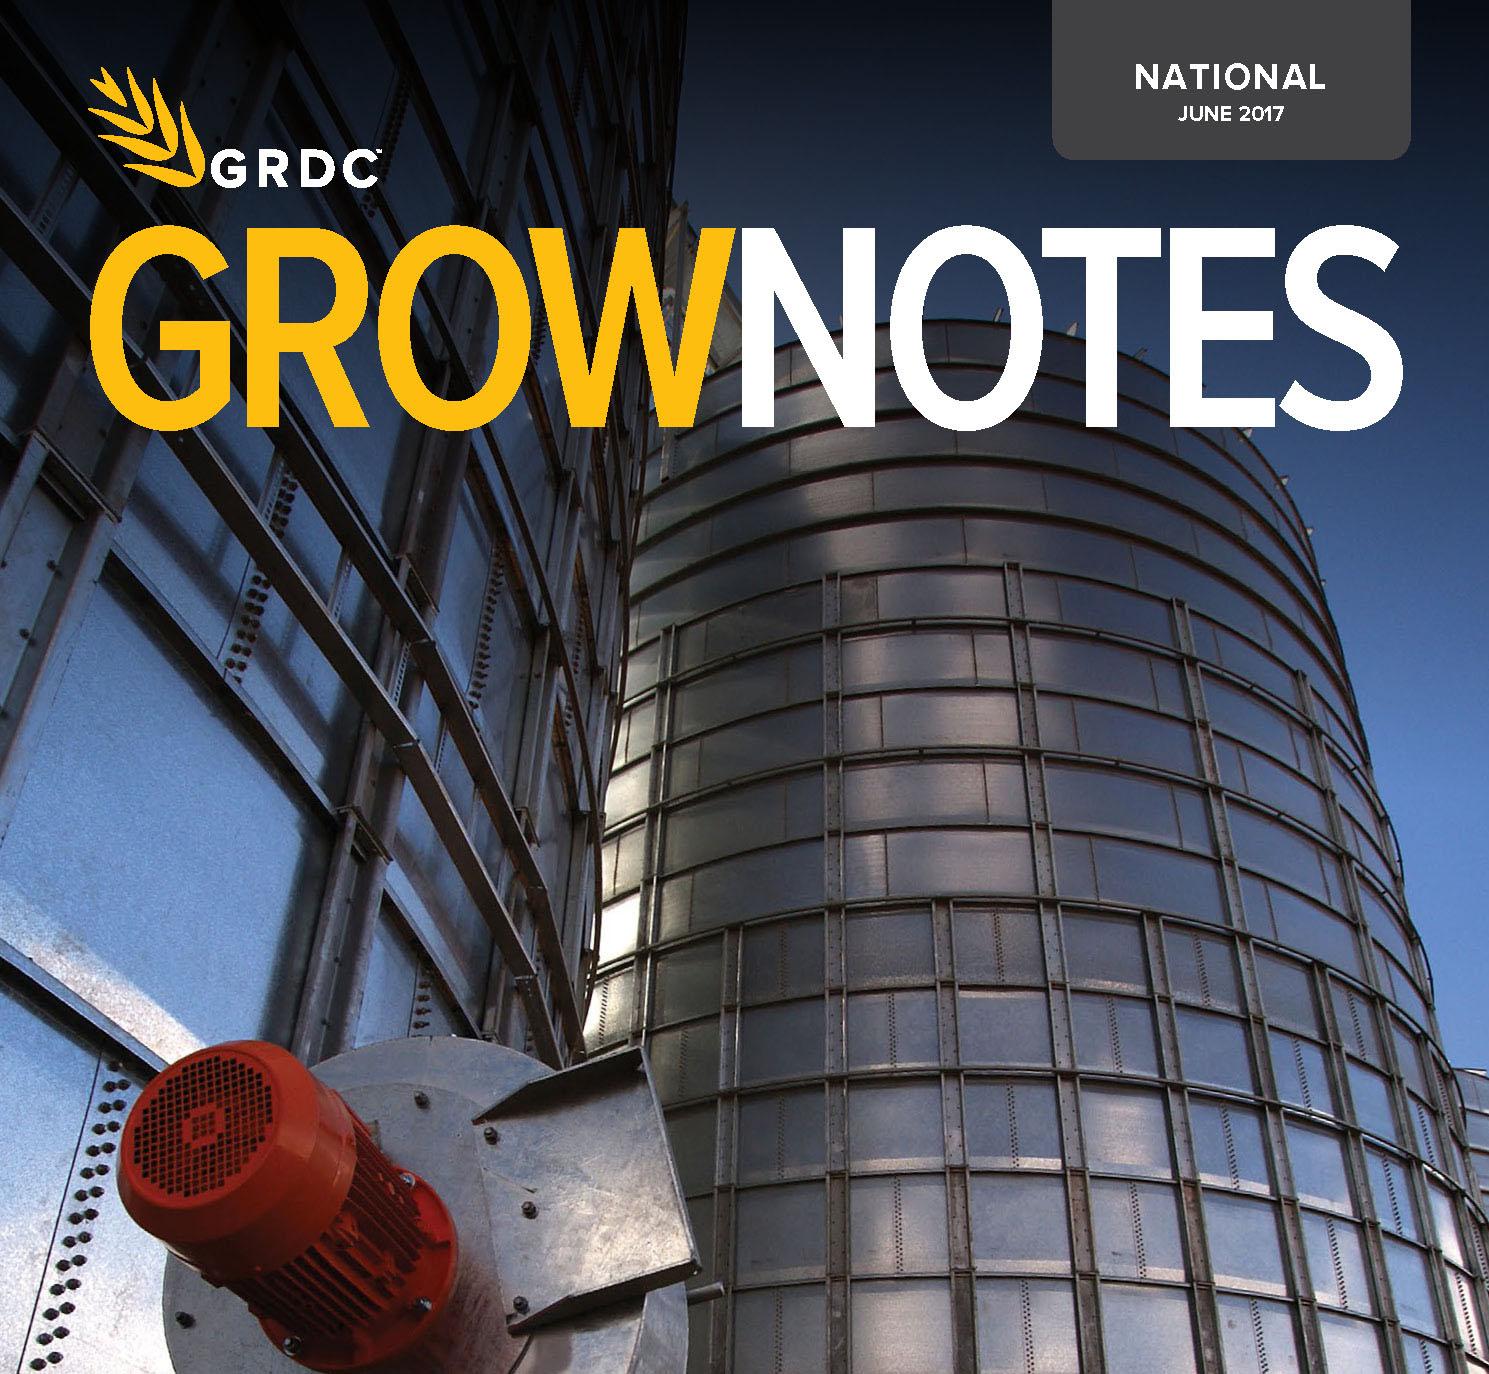 Grain storage grow notes